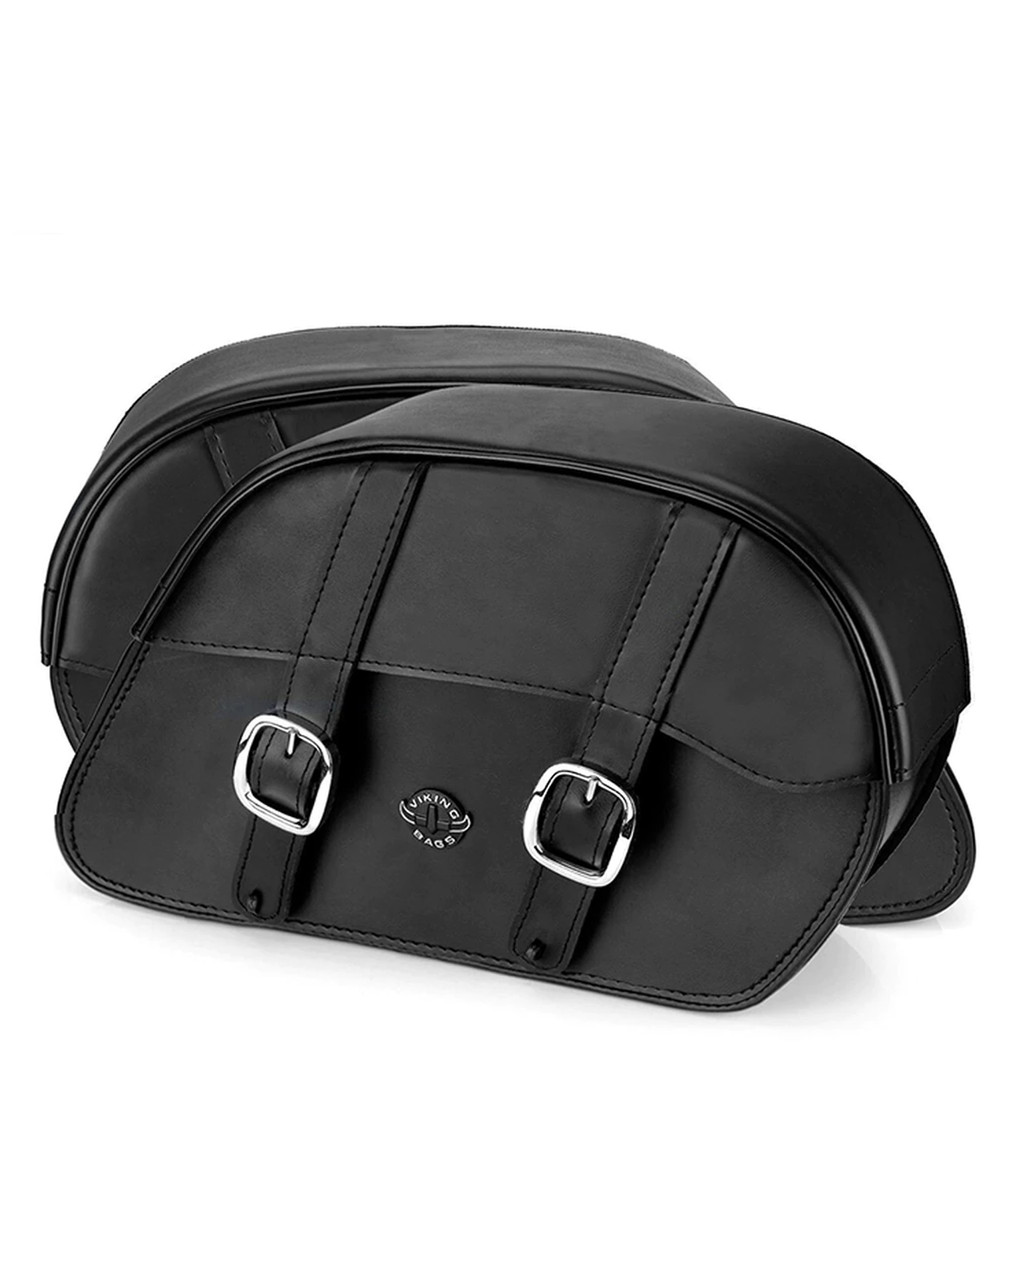 Honda 750 Shadow Aero Slant Medium Motorcycle Saddlebags Both Bags View